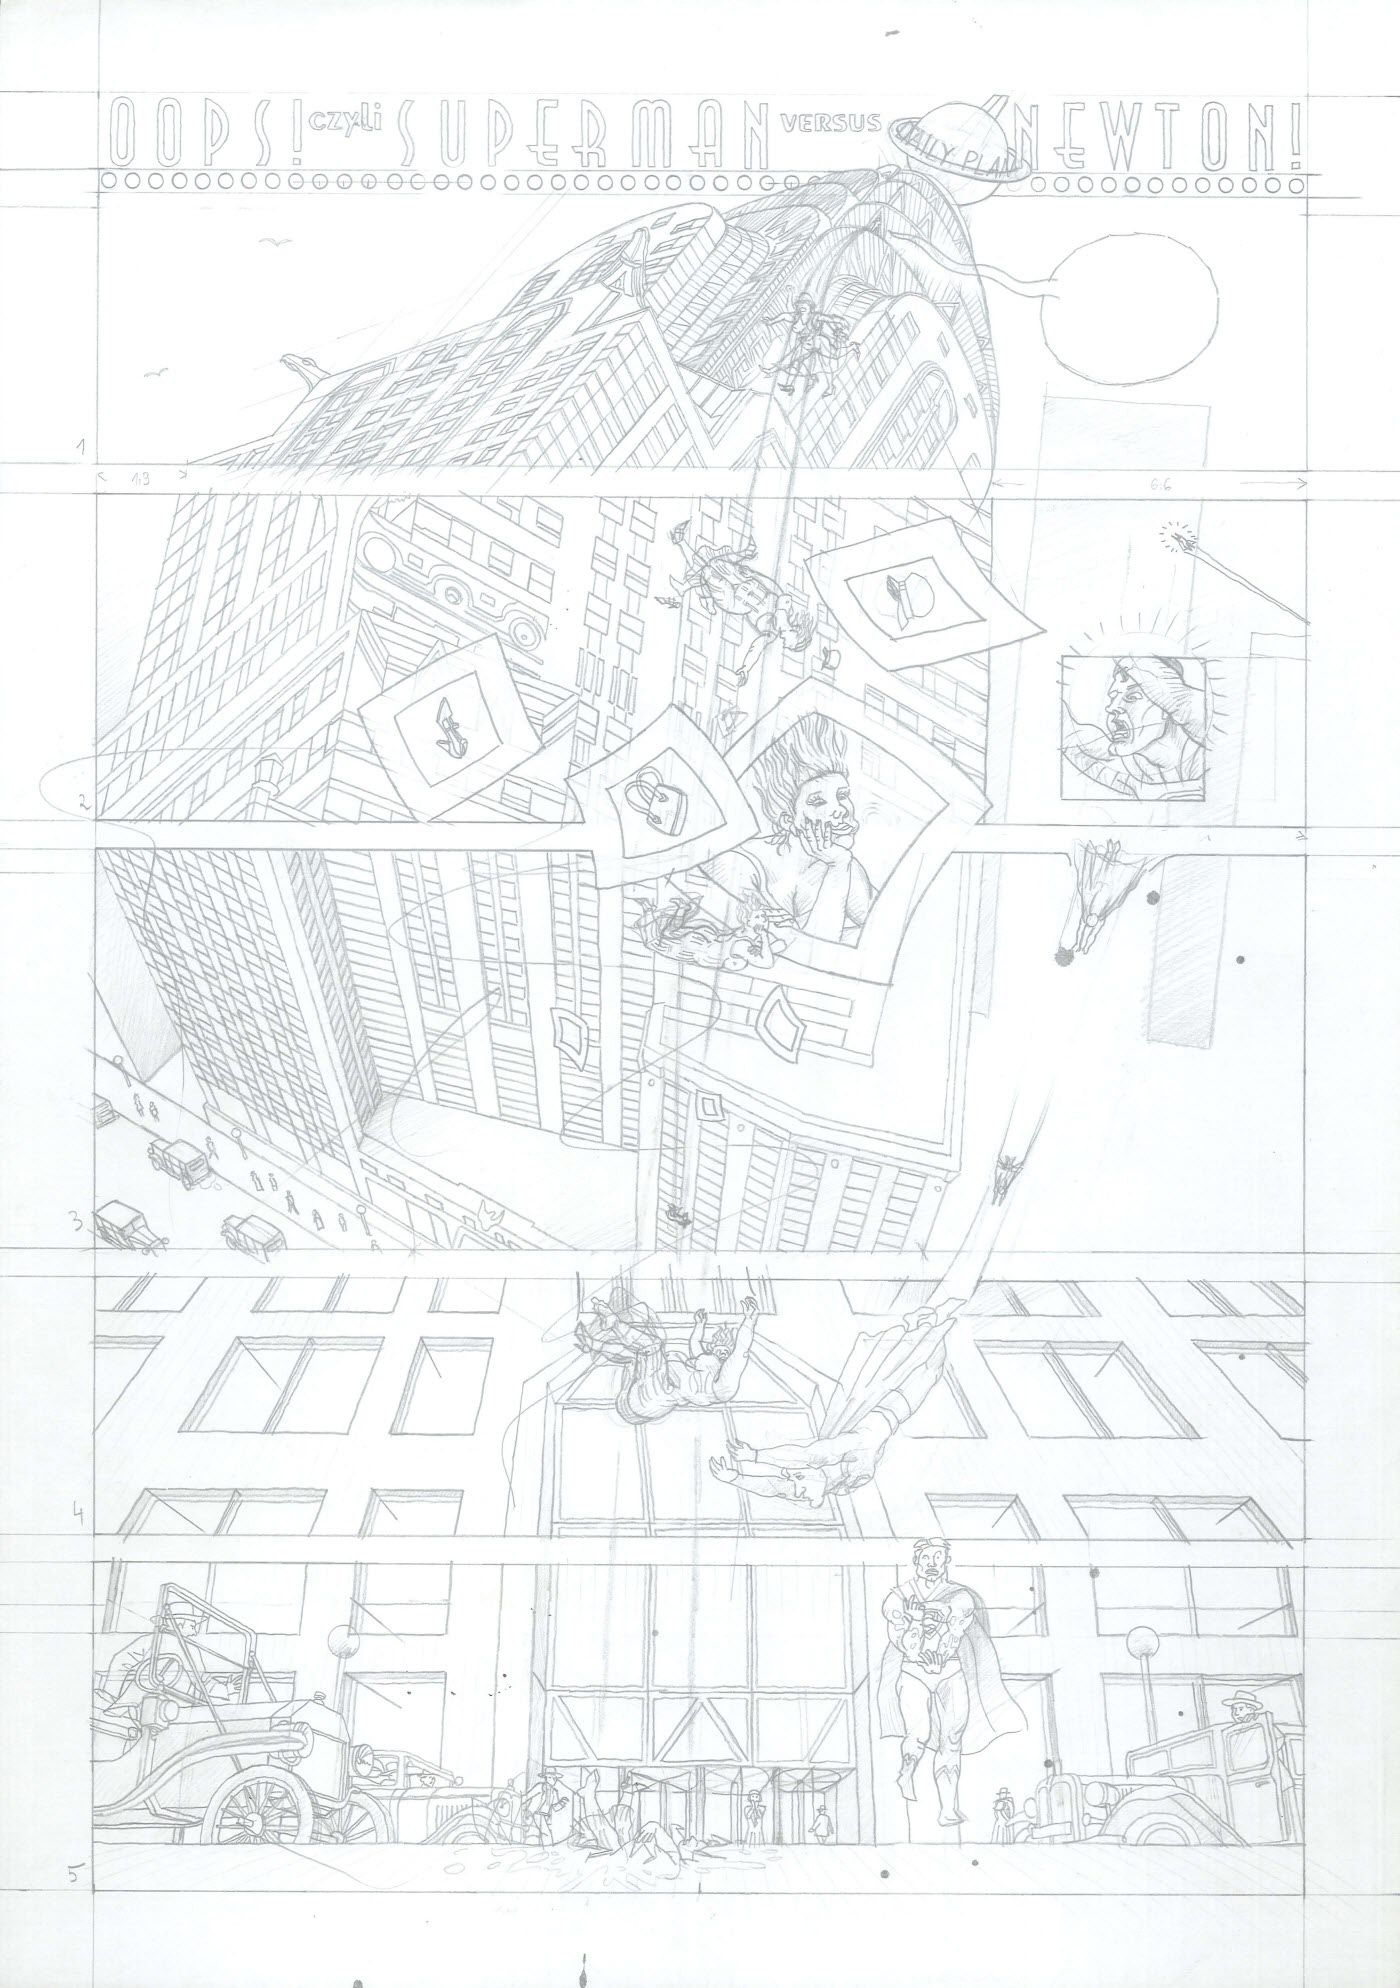 Oops! czyli Superman vs Newton (szkic)